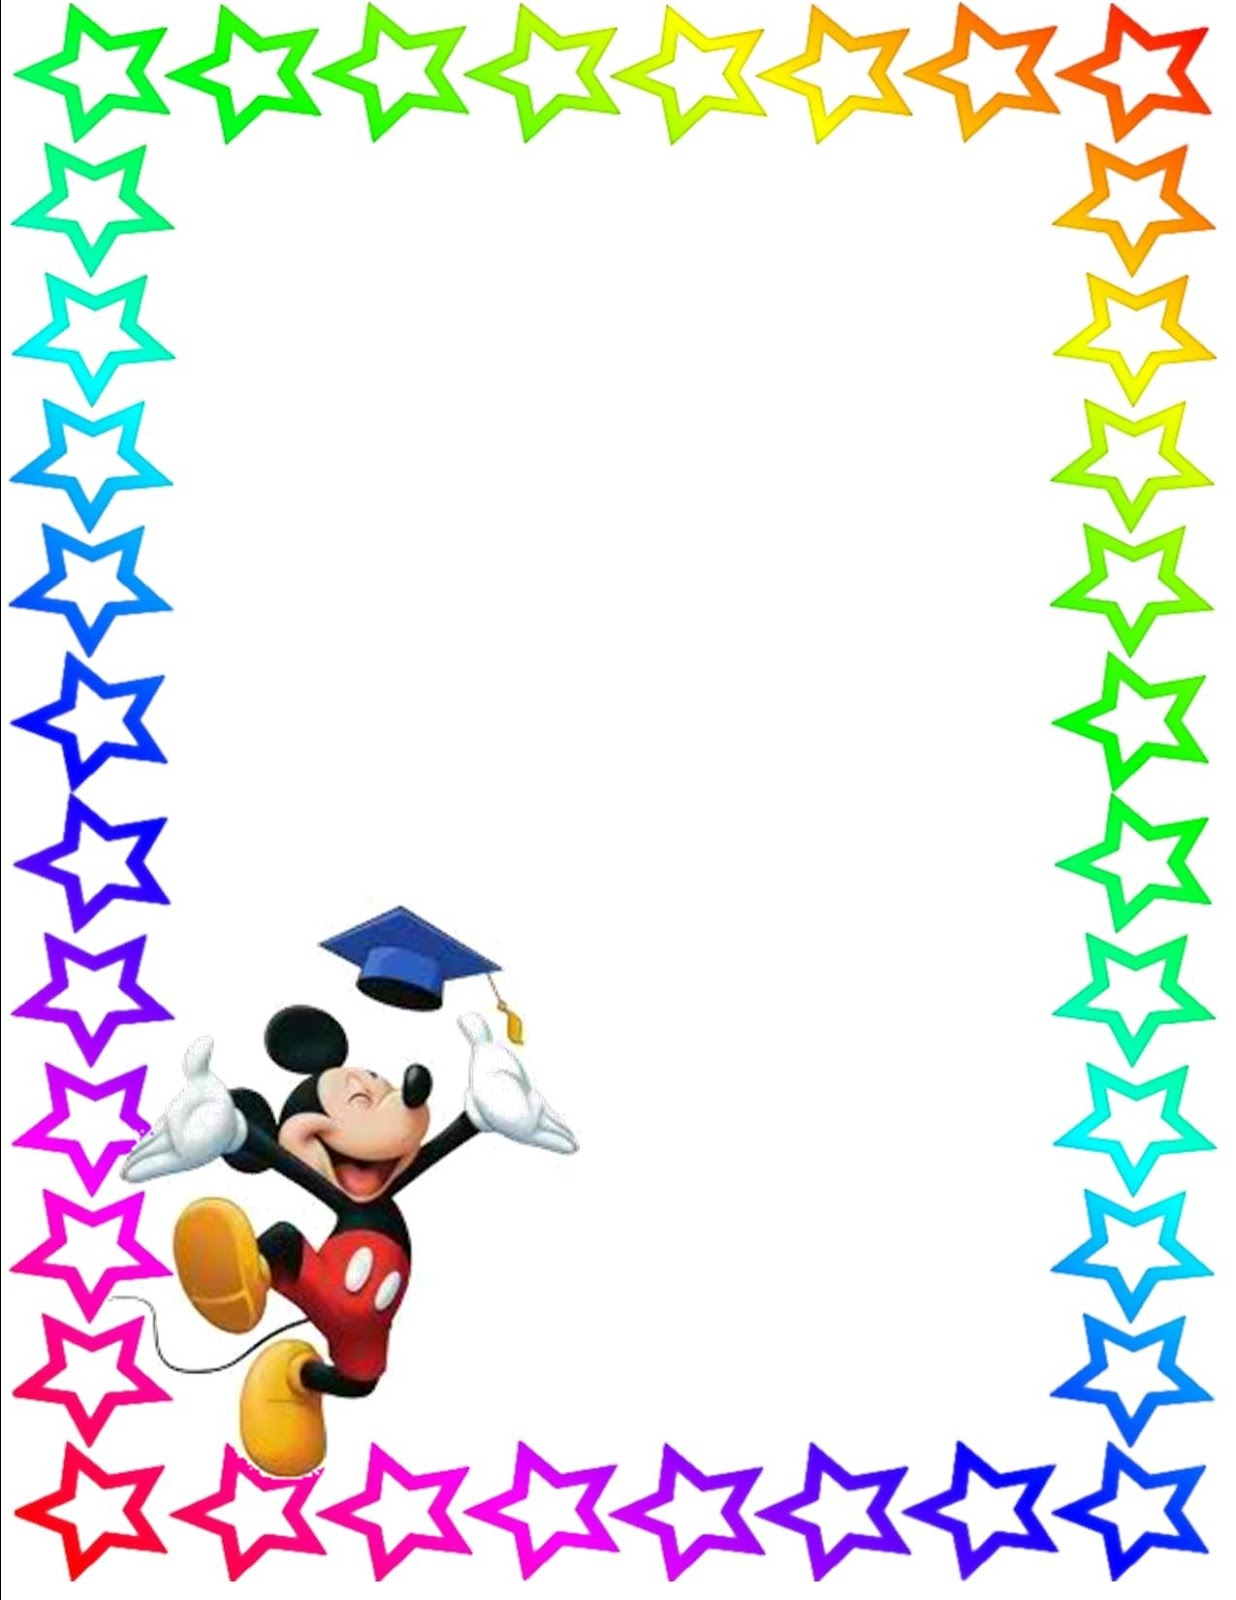 Disney Border Clip Art Clipartsco – Downloadable Page Borders for Microsoft Word